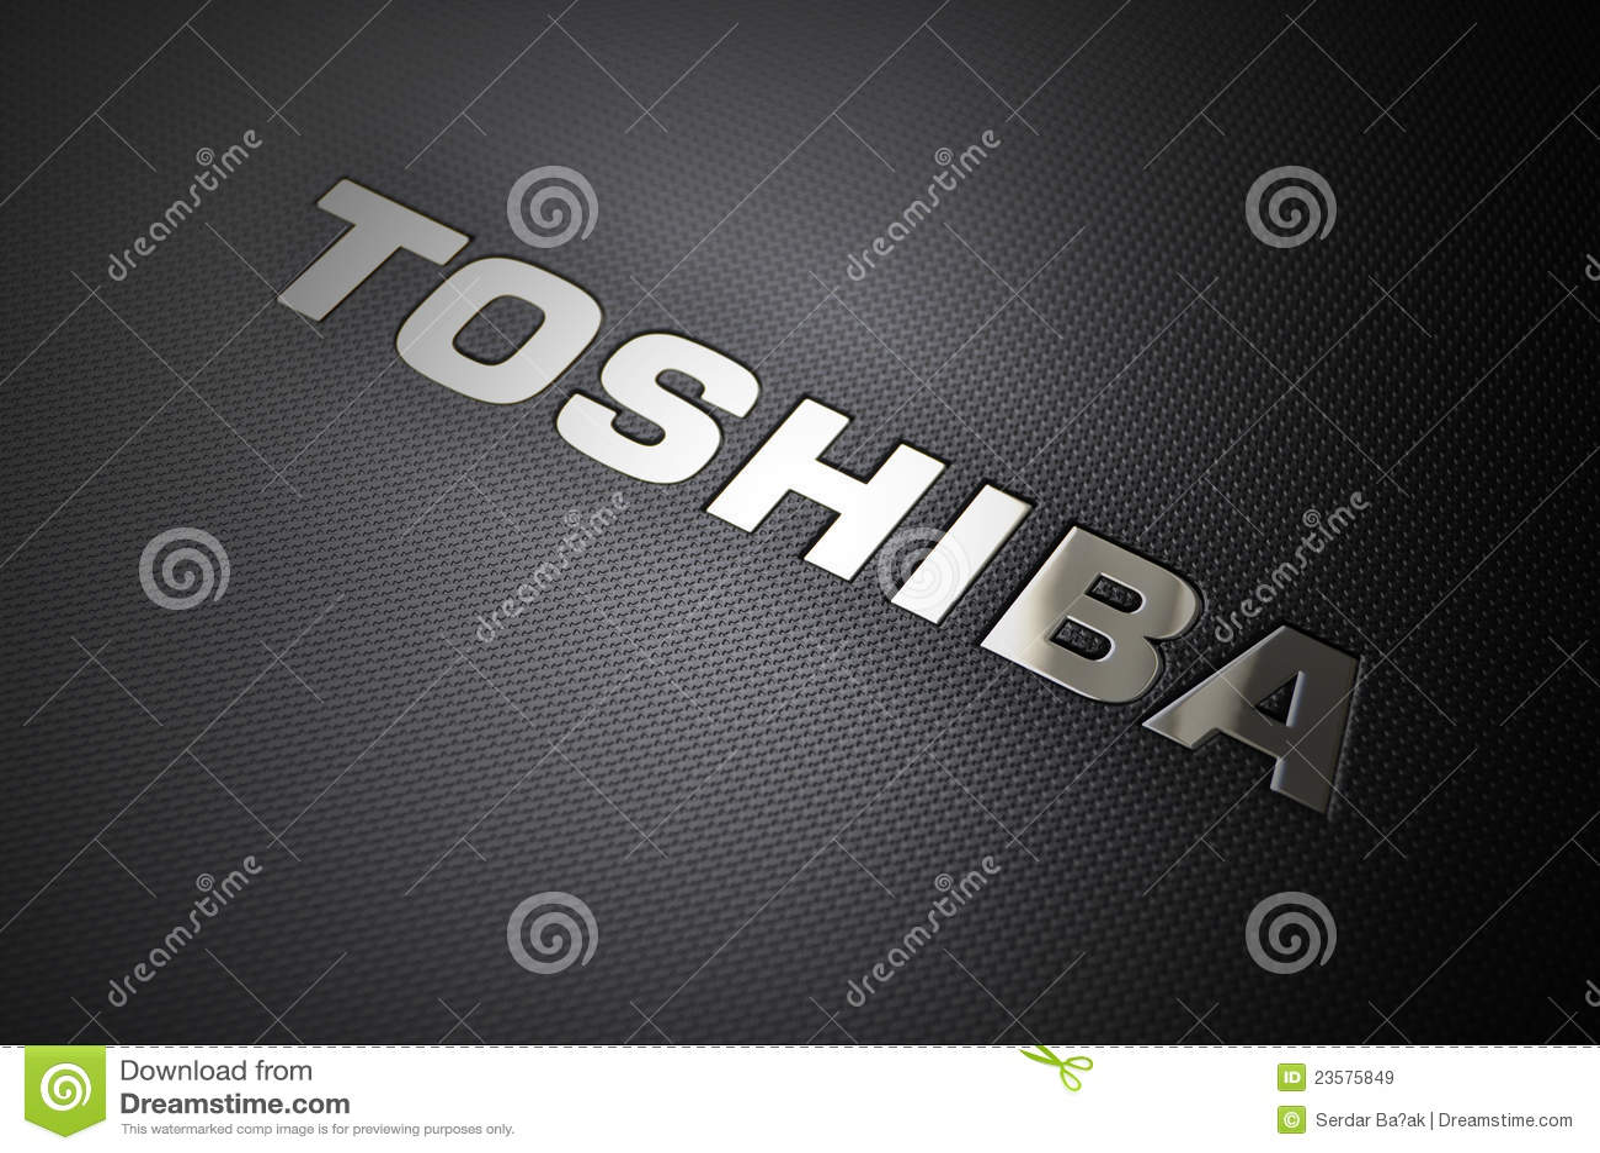 Toshiba Laptop Logo Editorial Stock Image  Image 23575849